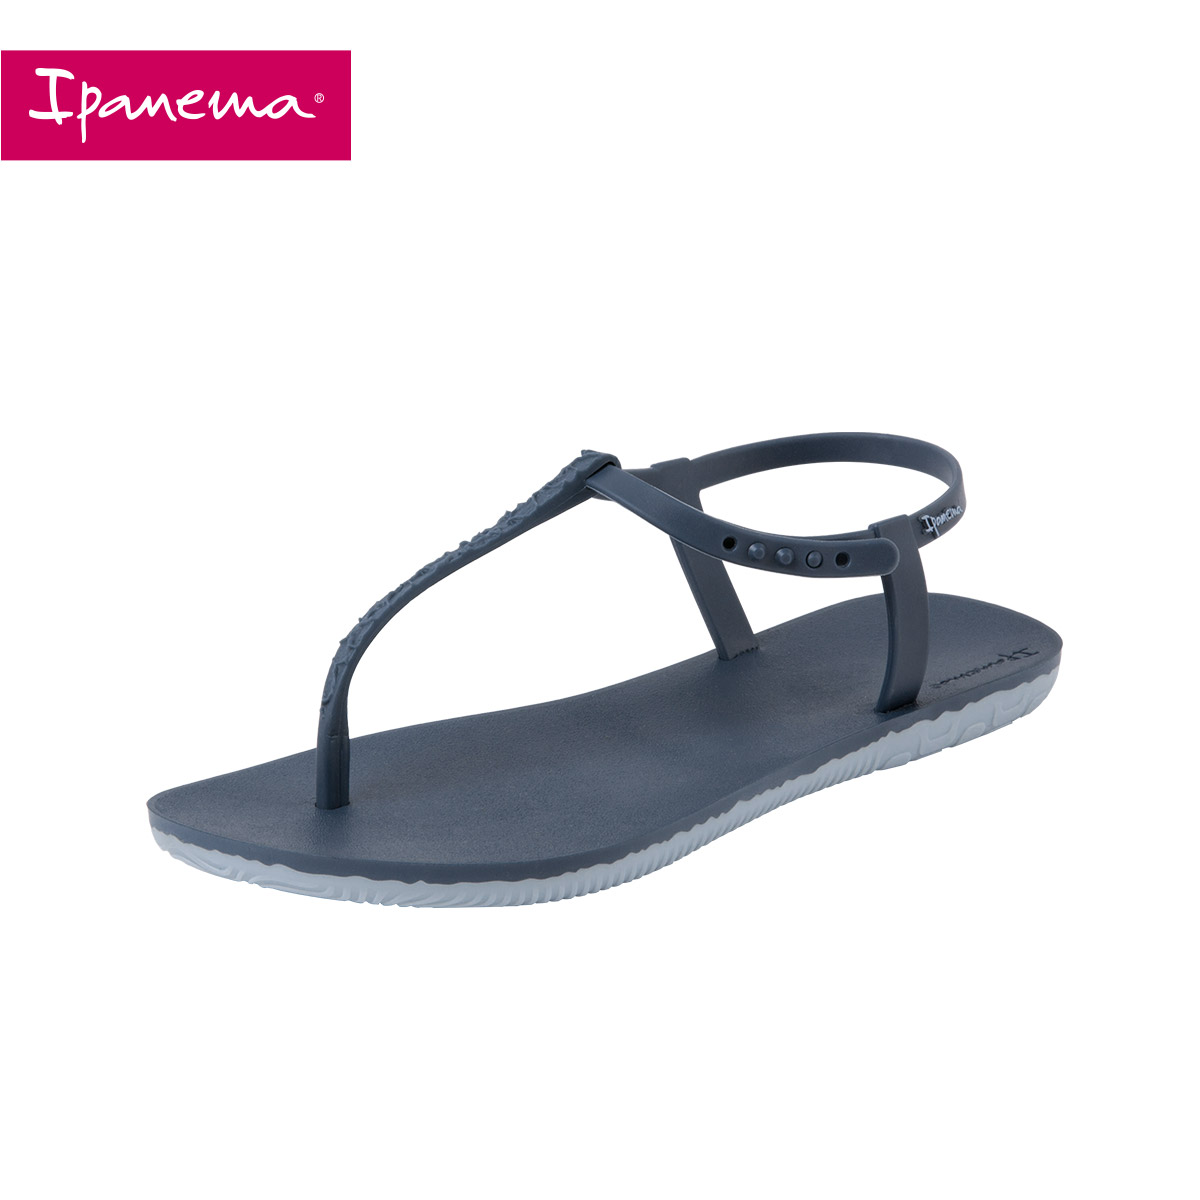 Ipanema凉鞋女ins潮夏季简约时尚女鞋新款海边沙滩鞋平底凉拖鞋